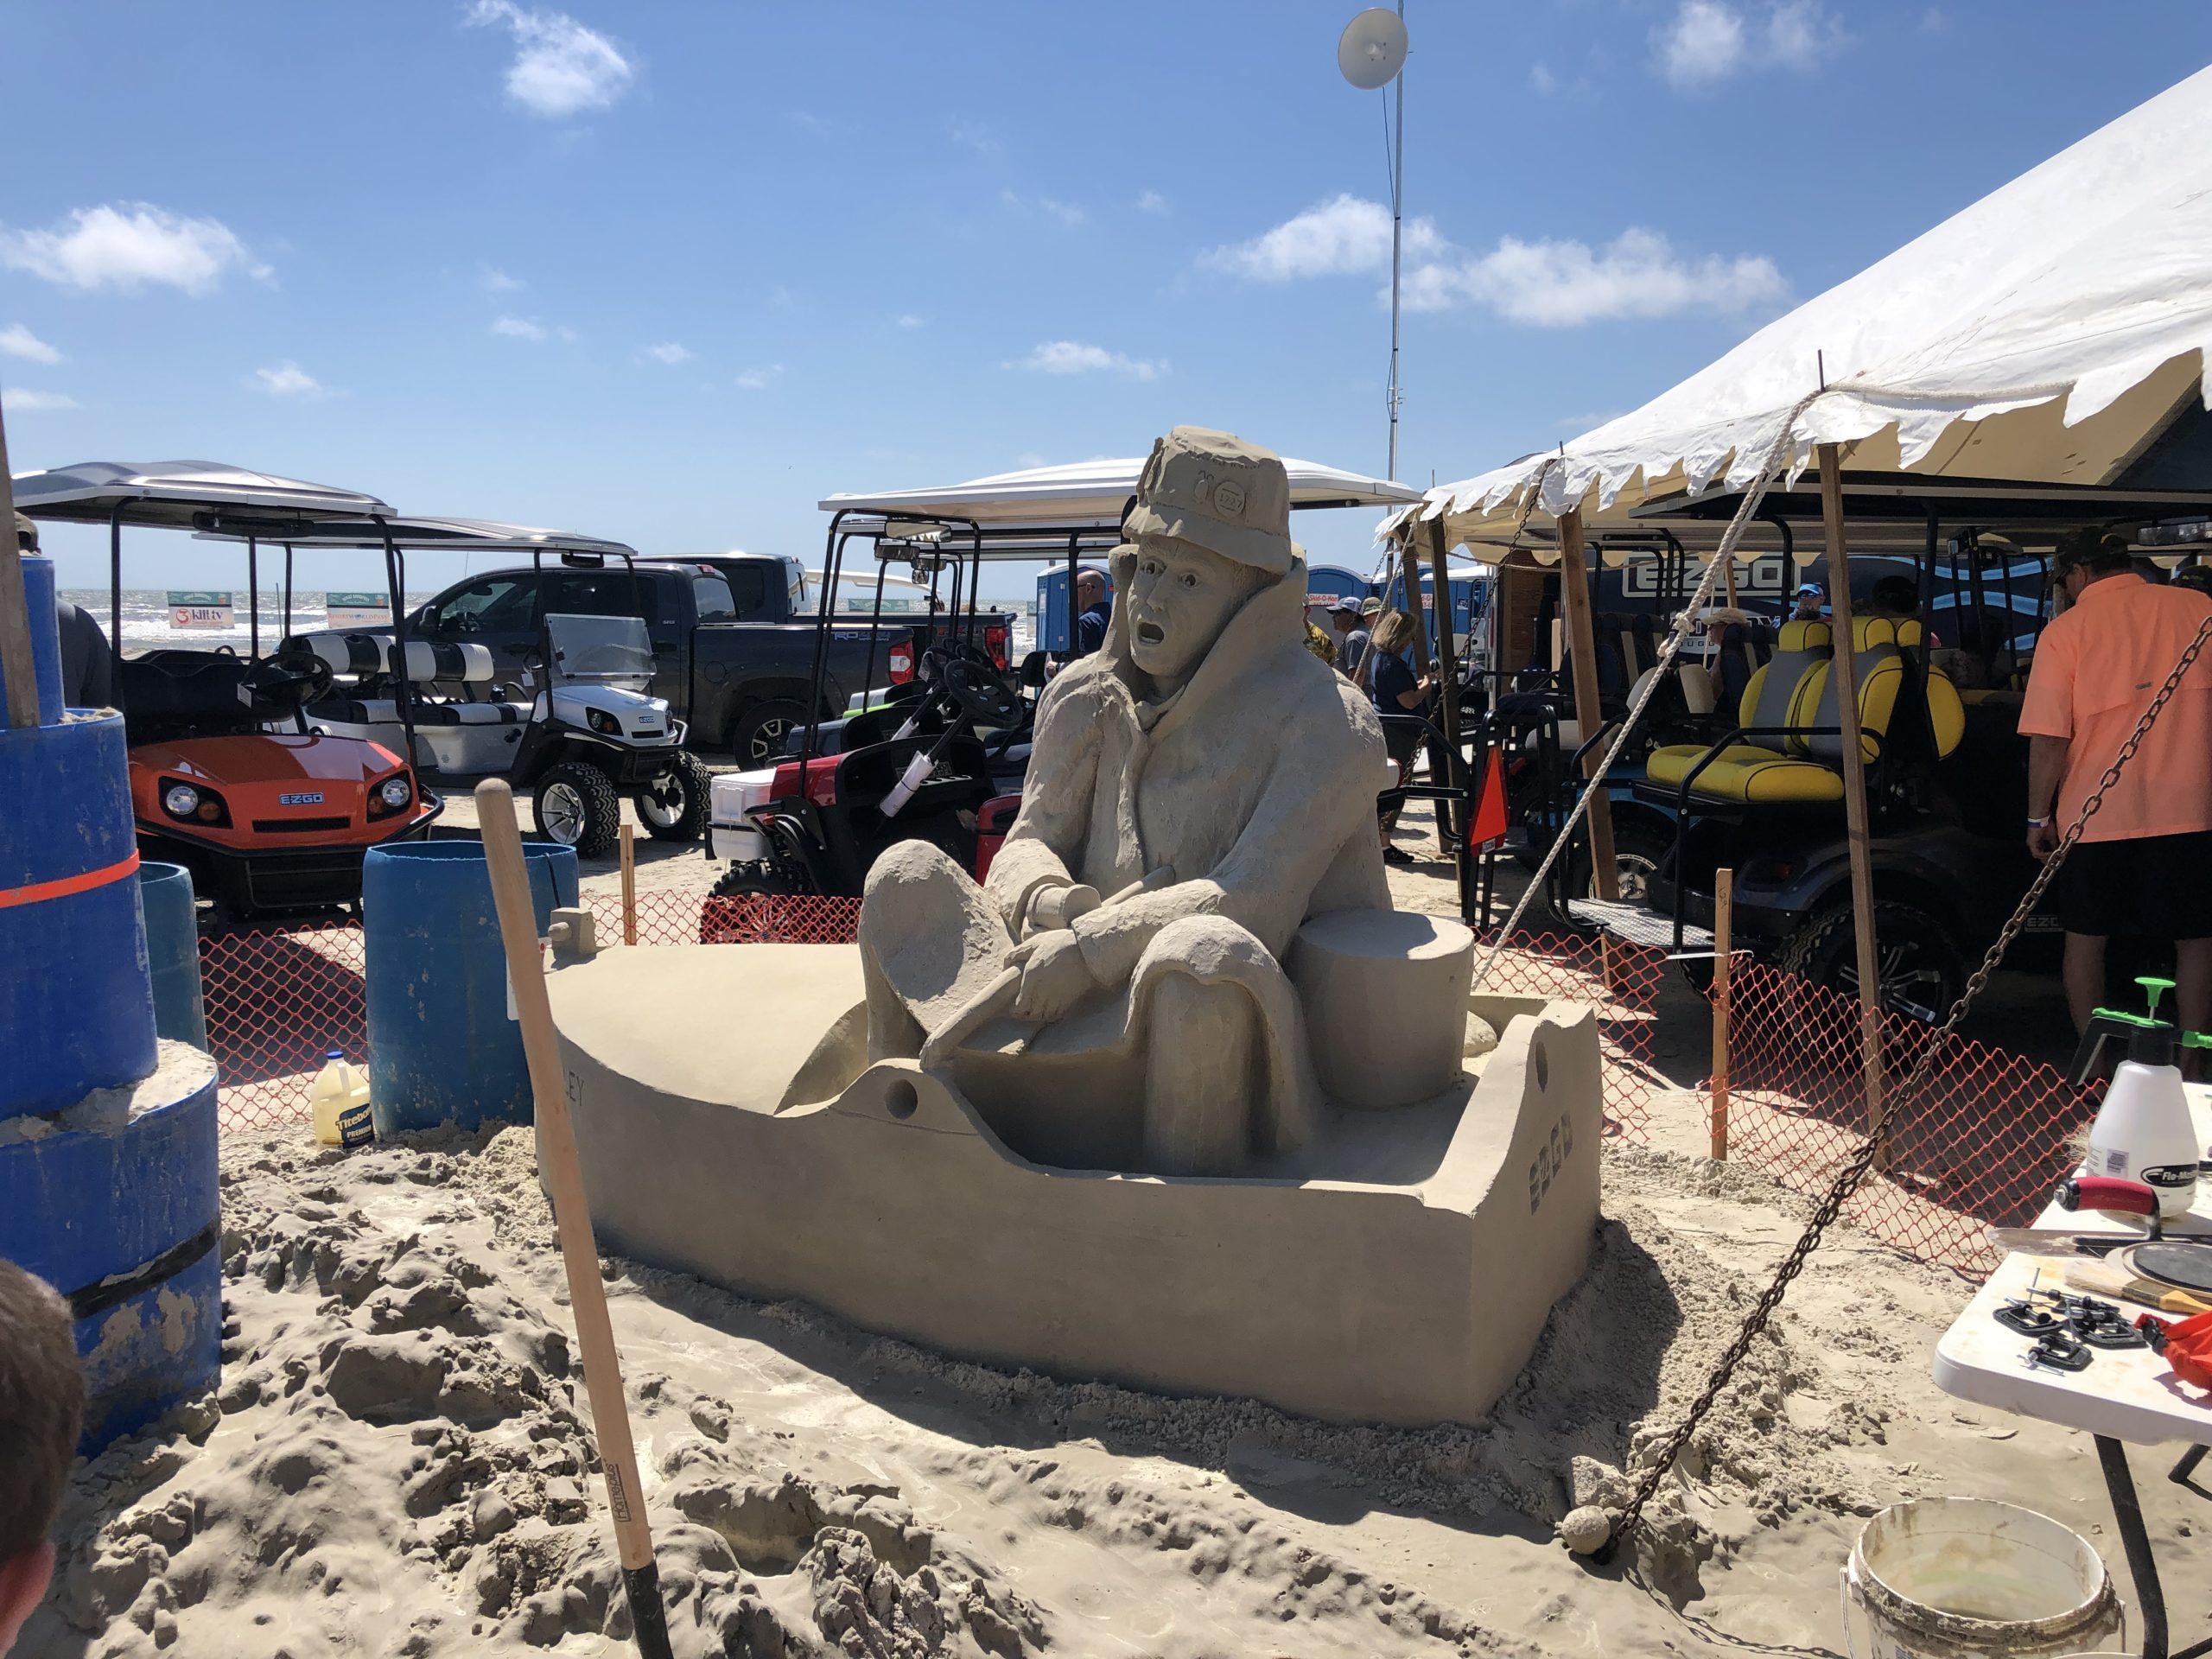 Texas SandFest in Port Aransas | www.portaransastex.com